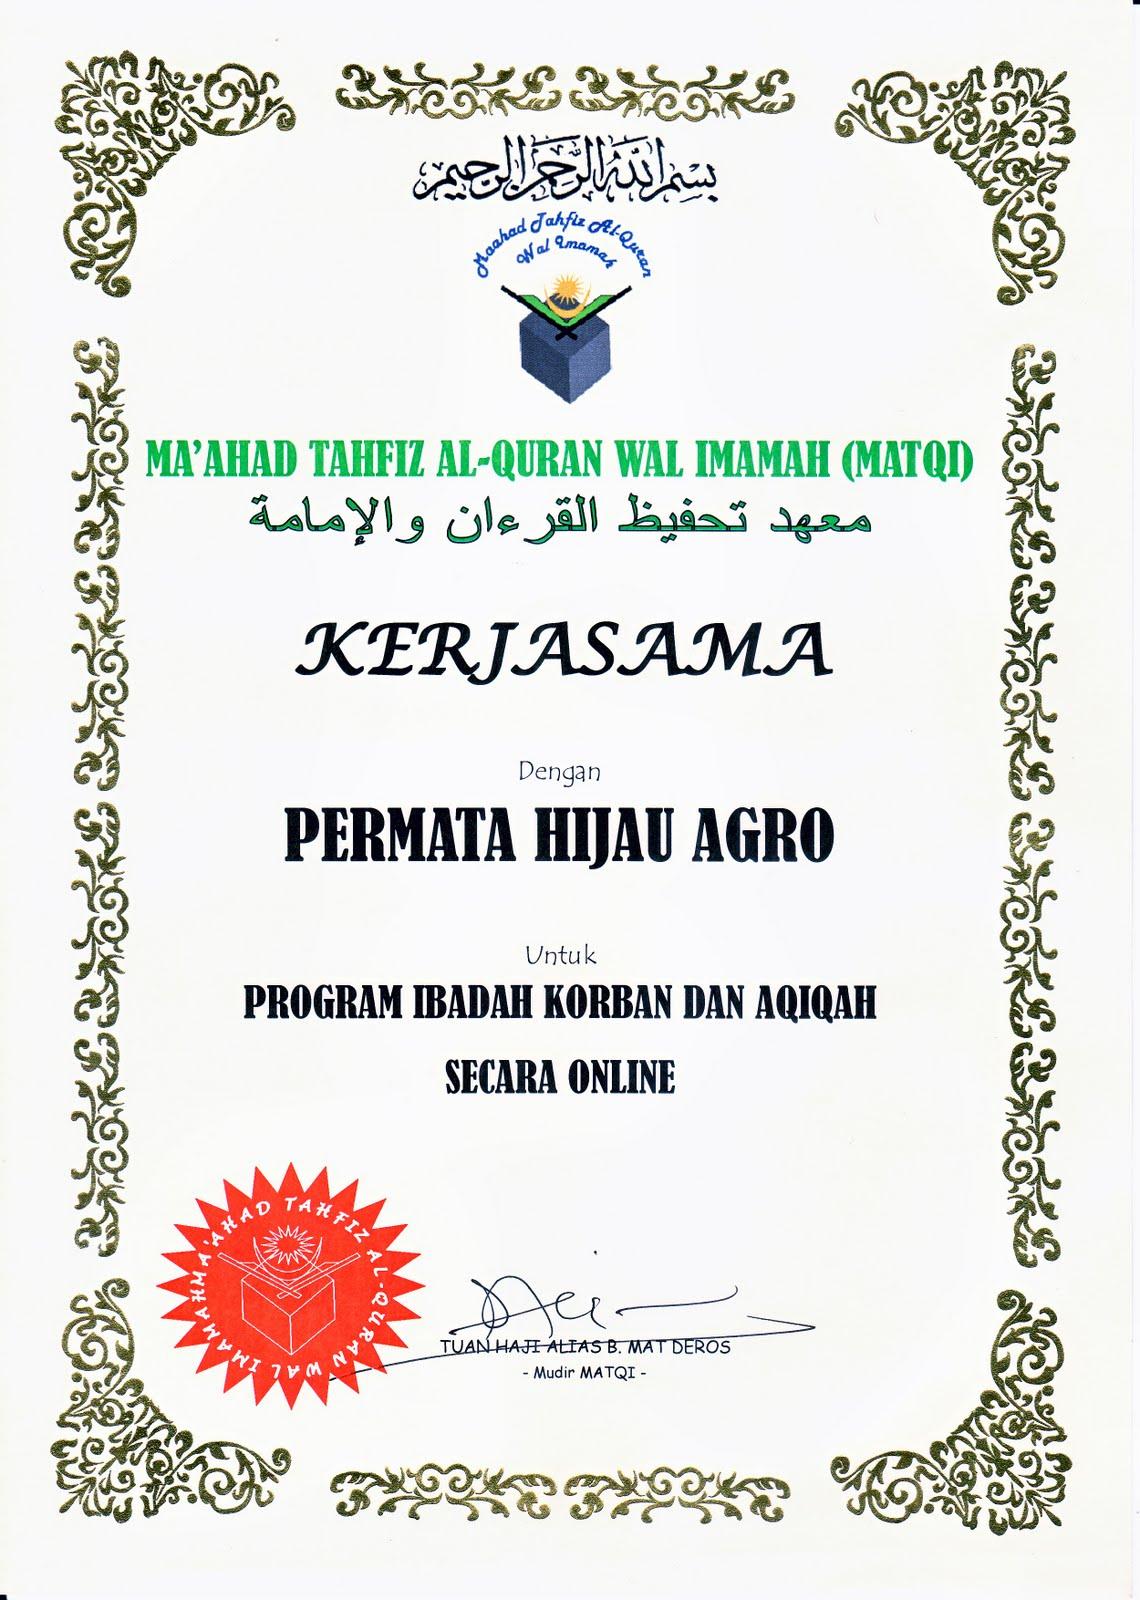 projekmeru.blogspot.com: Korban & Aqiqah Secara On Line